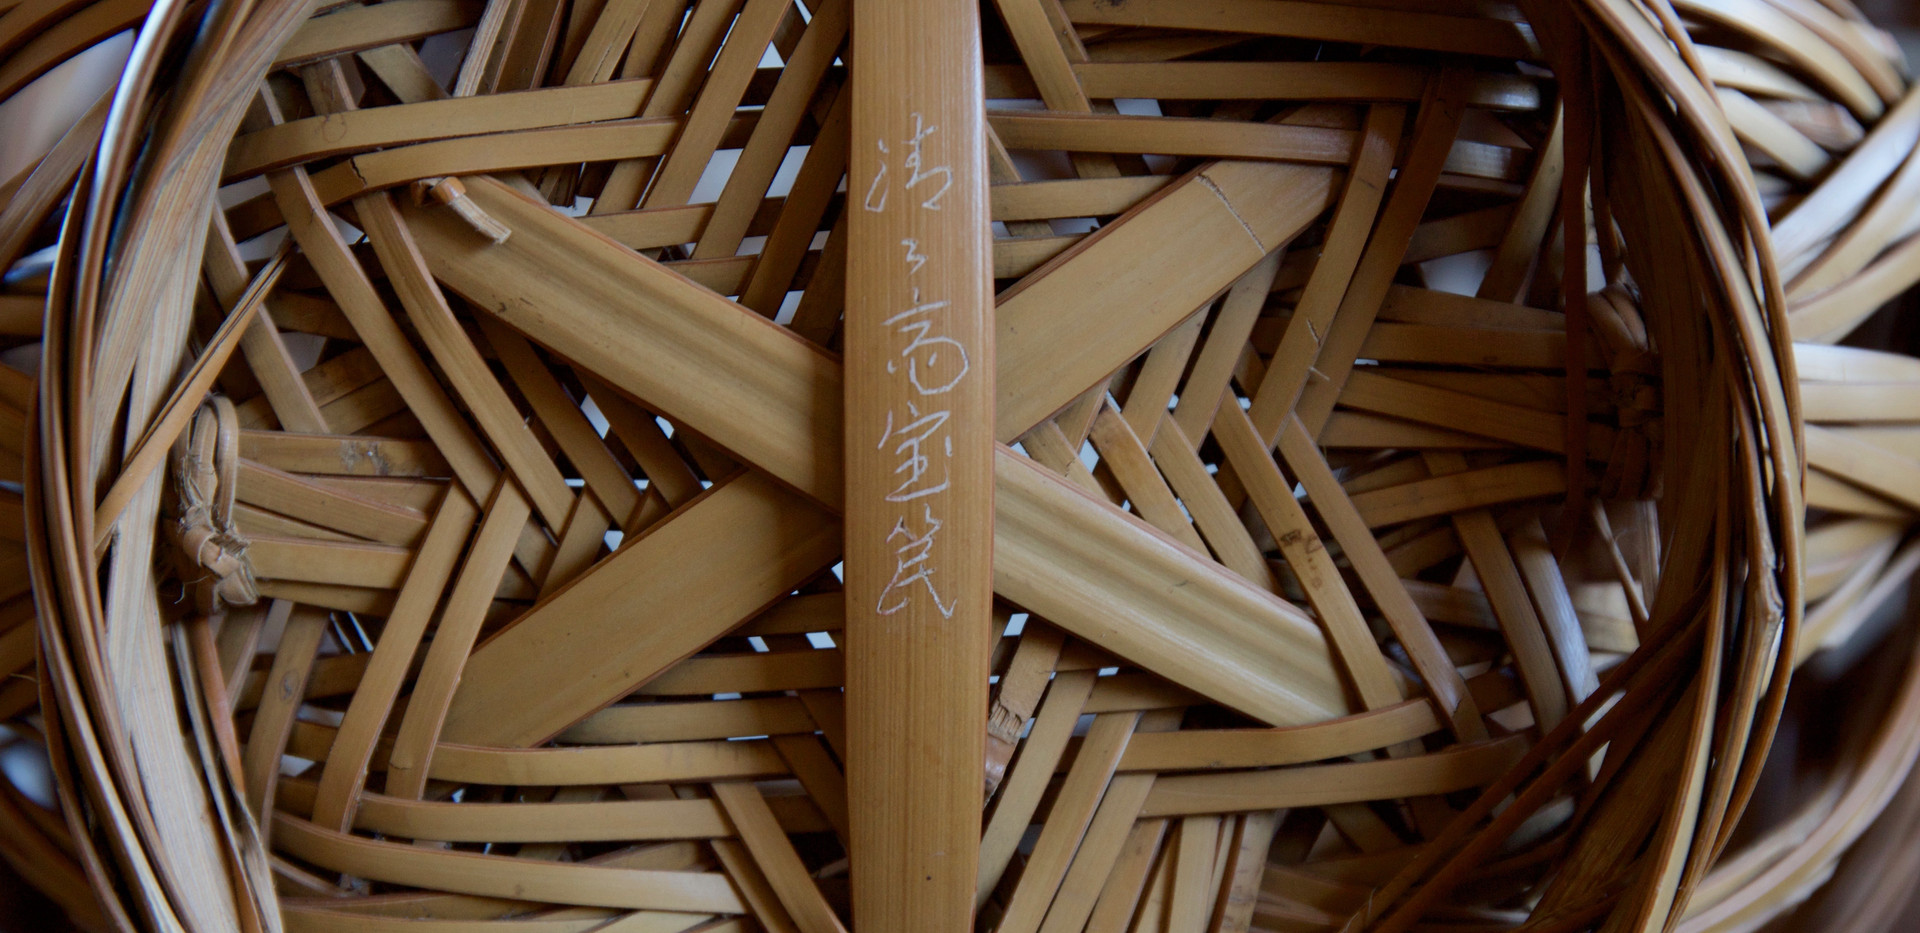 Ieda Seseisai Bamboo Basket 06.jpg